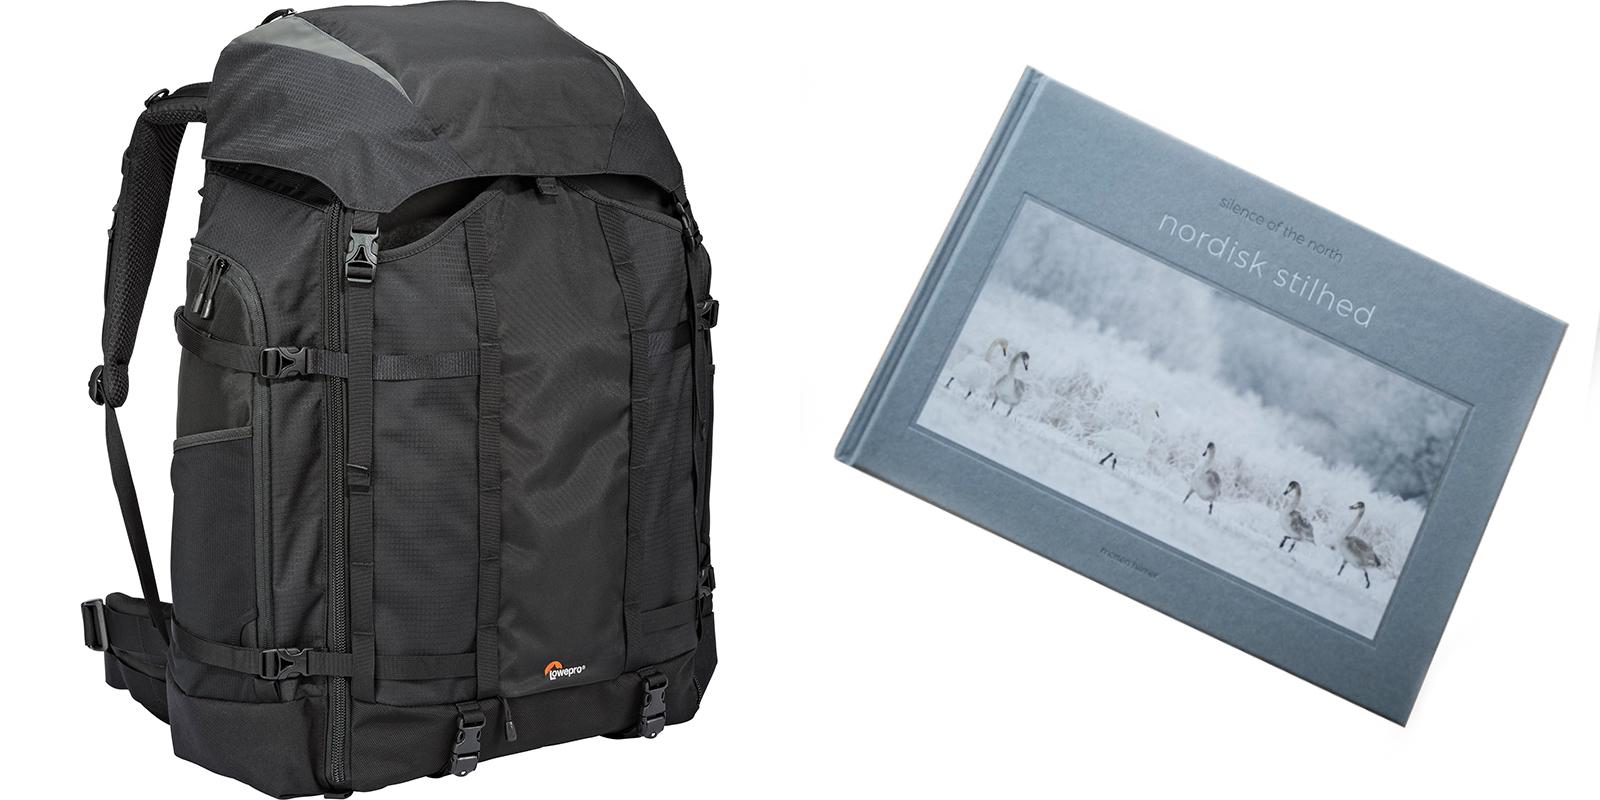 Pro Trekker 650 AW Lowepro Camera Bag Giveaway